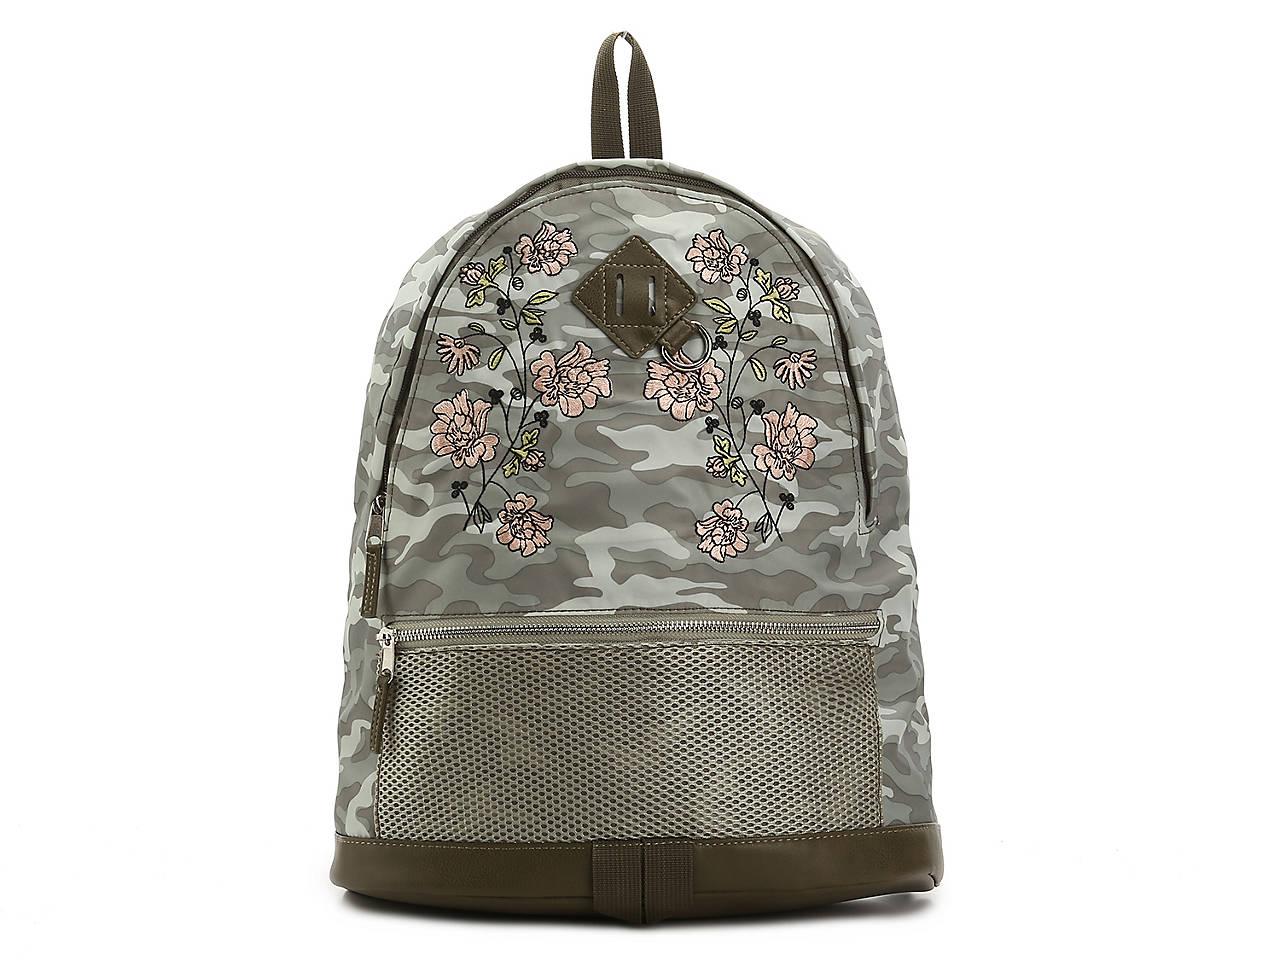 Madden Girl Catch Backpack Women's Handbags & Accessories | DSW